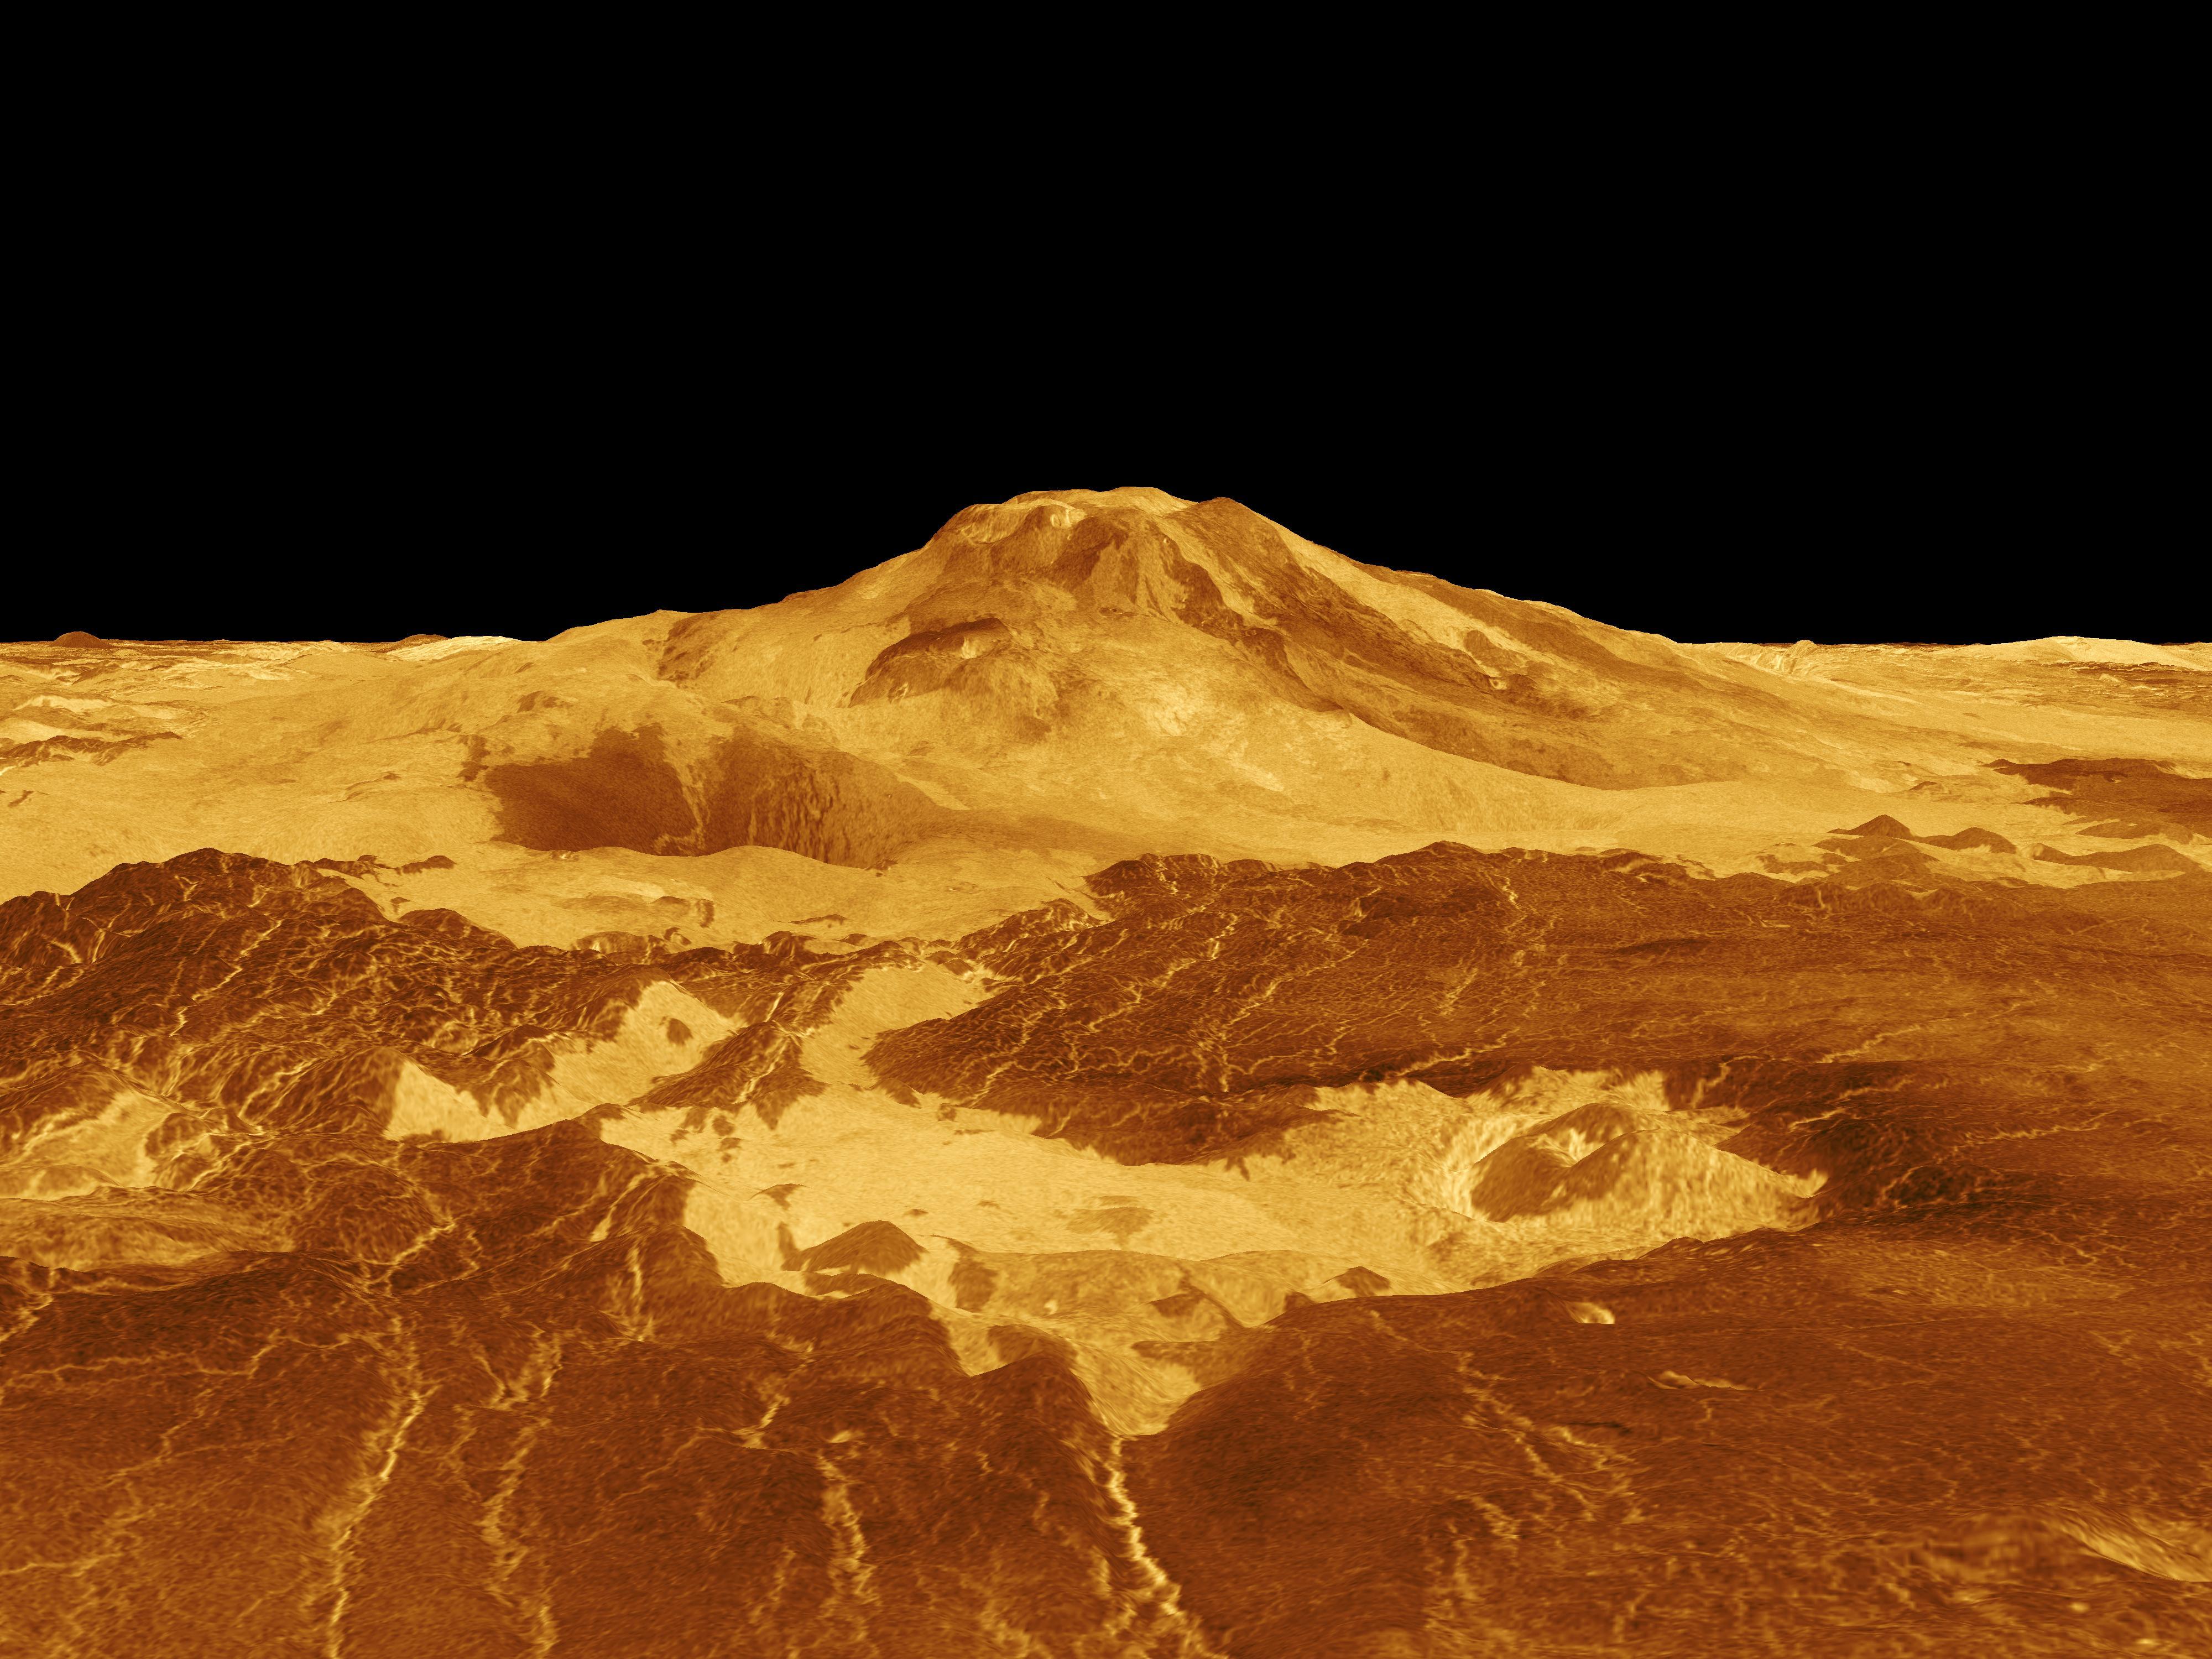 File:Venus - 3D Perspective View of Maat Mons.jpg - Wikipedia